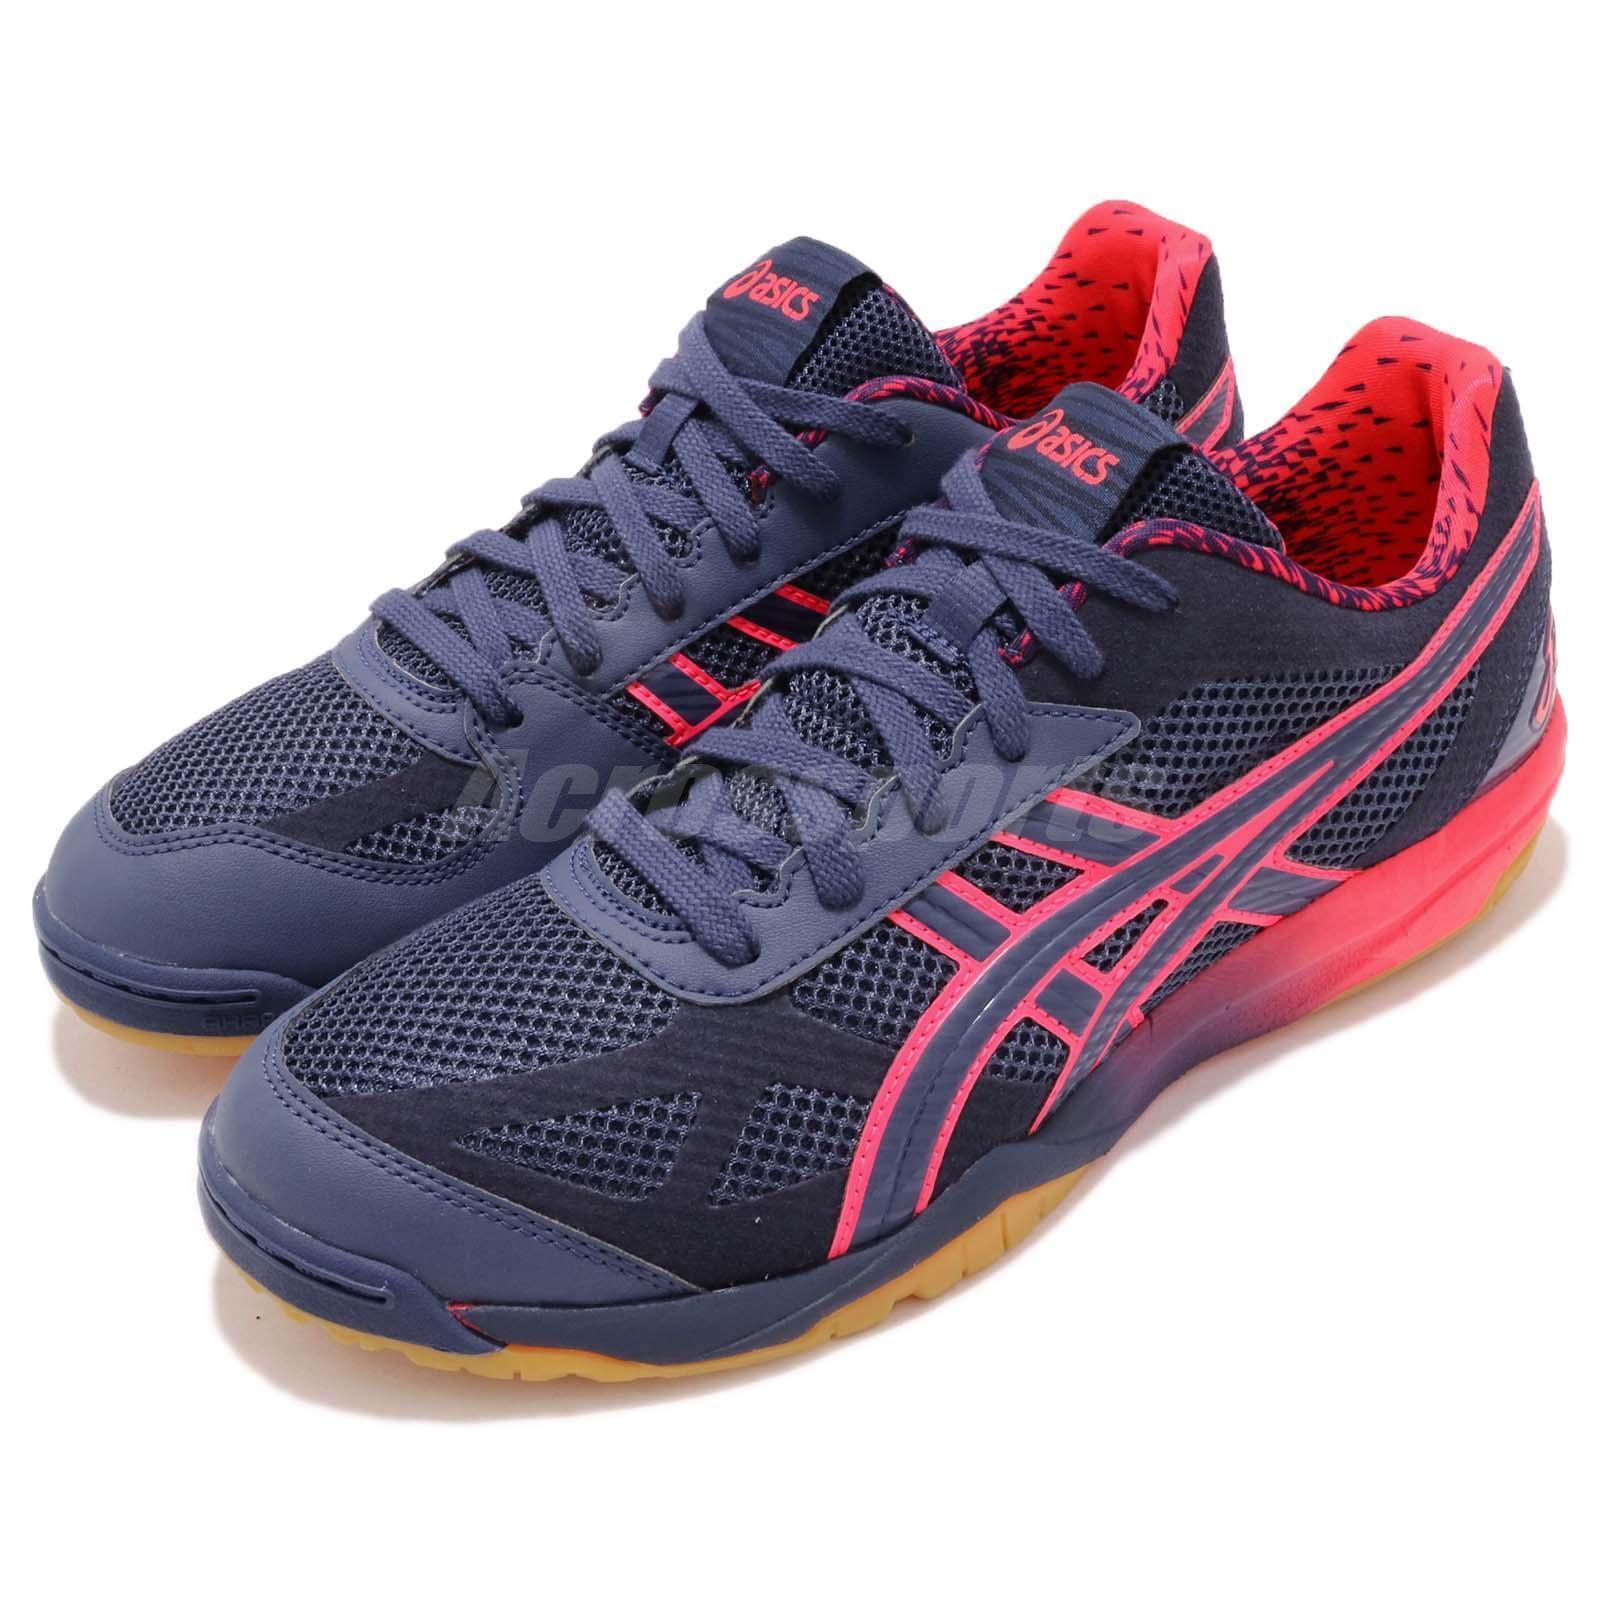 Asics rougee Japon Lyte AWC bleu indigo rose chewing-Gum Volleyball Badminton 1053A00-1400